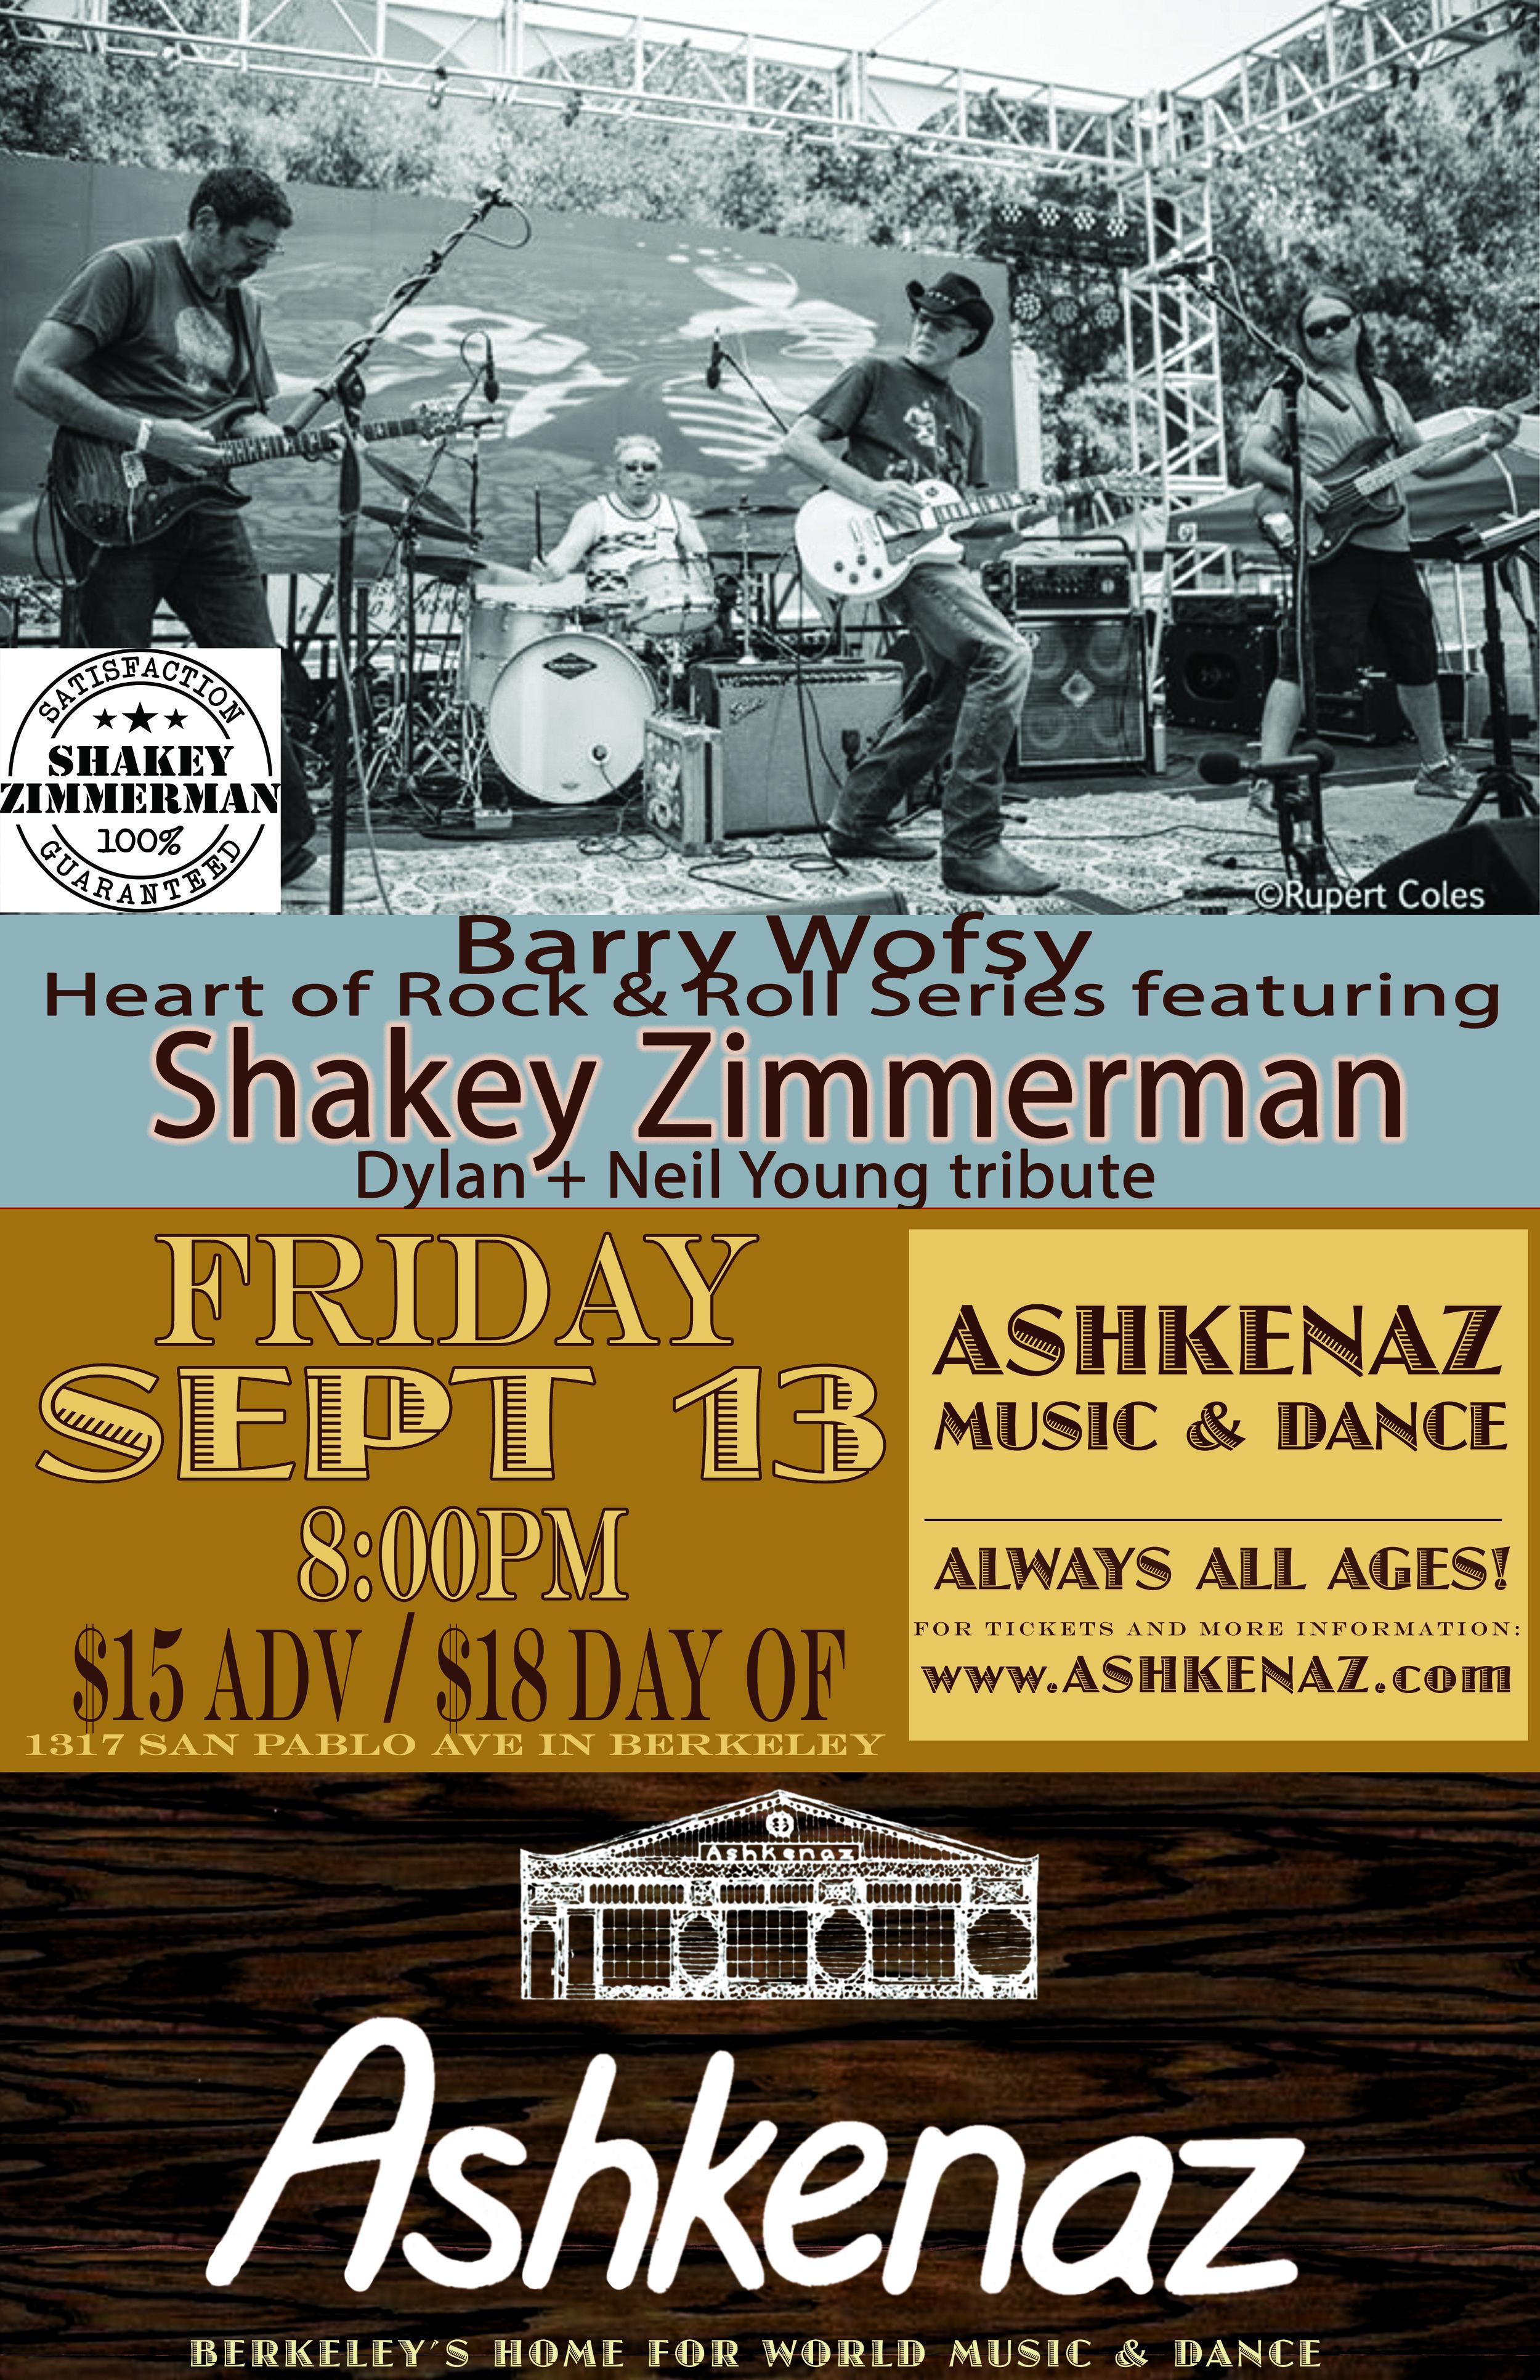 SHAKEY ZIMMERMAN 9-13-19.jpg